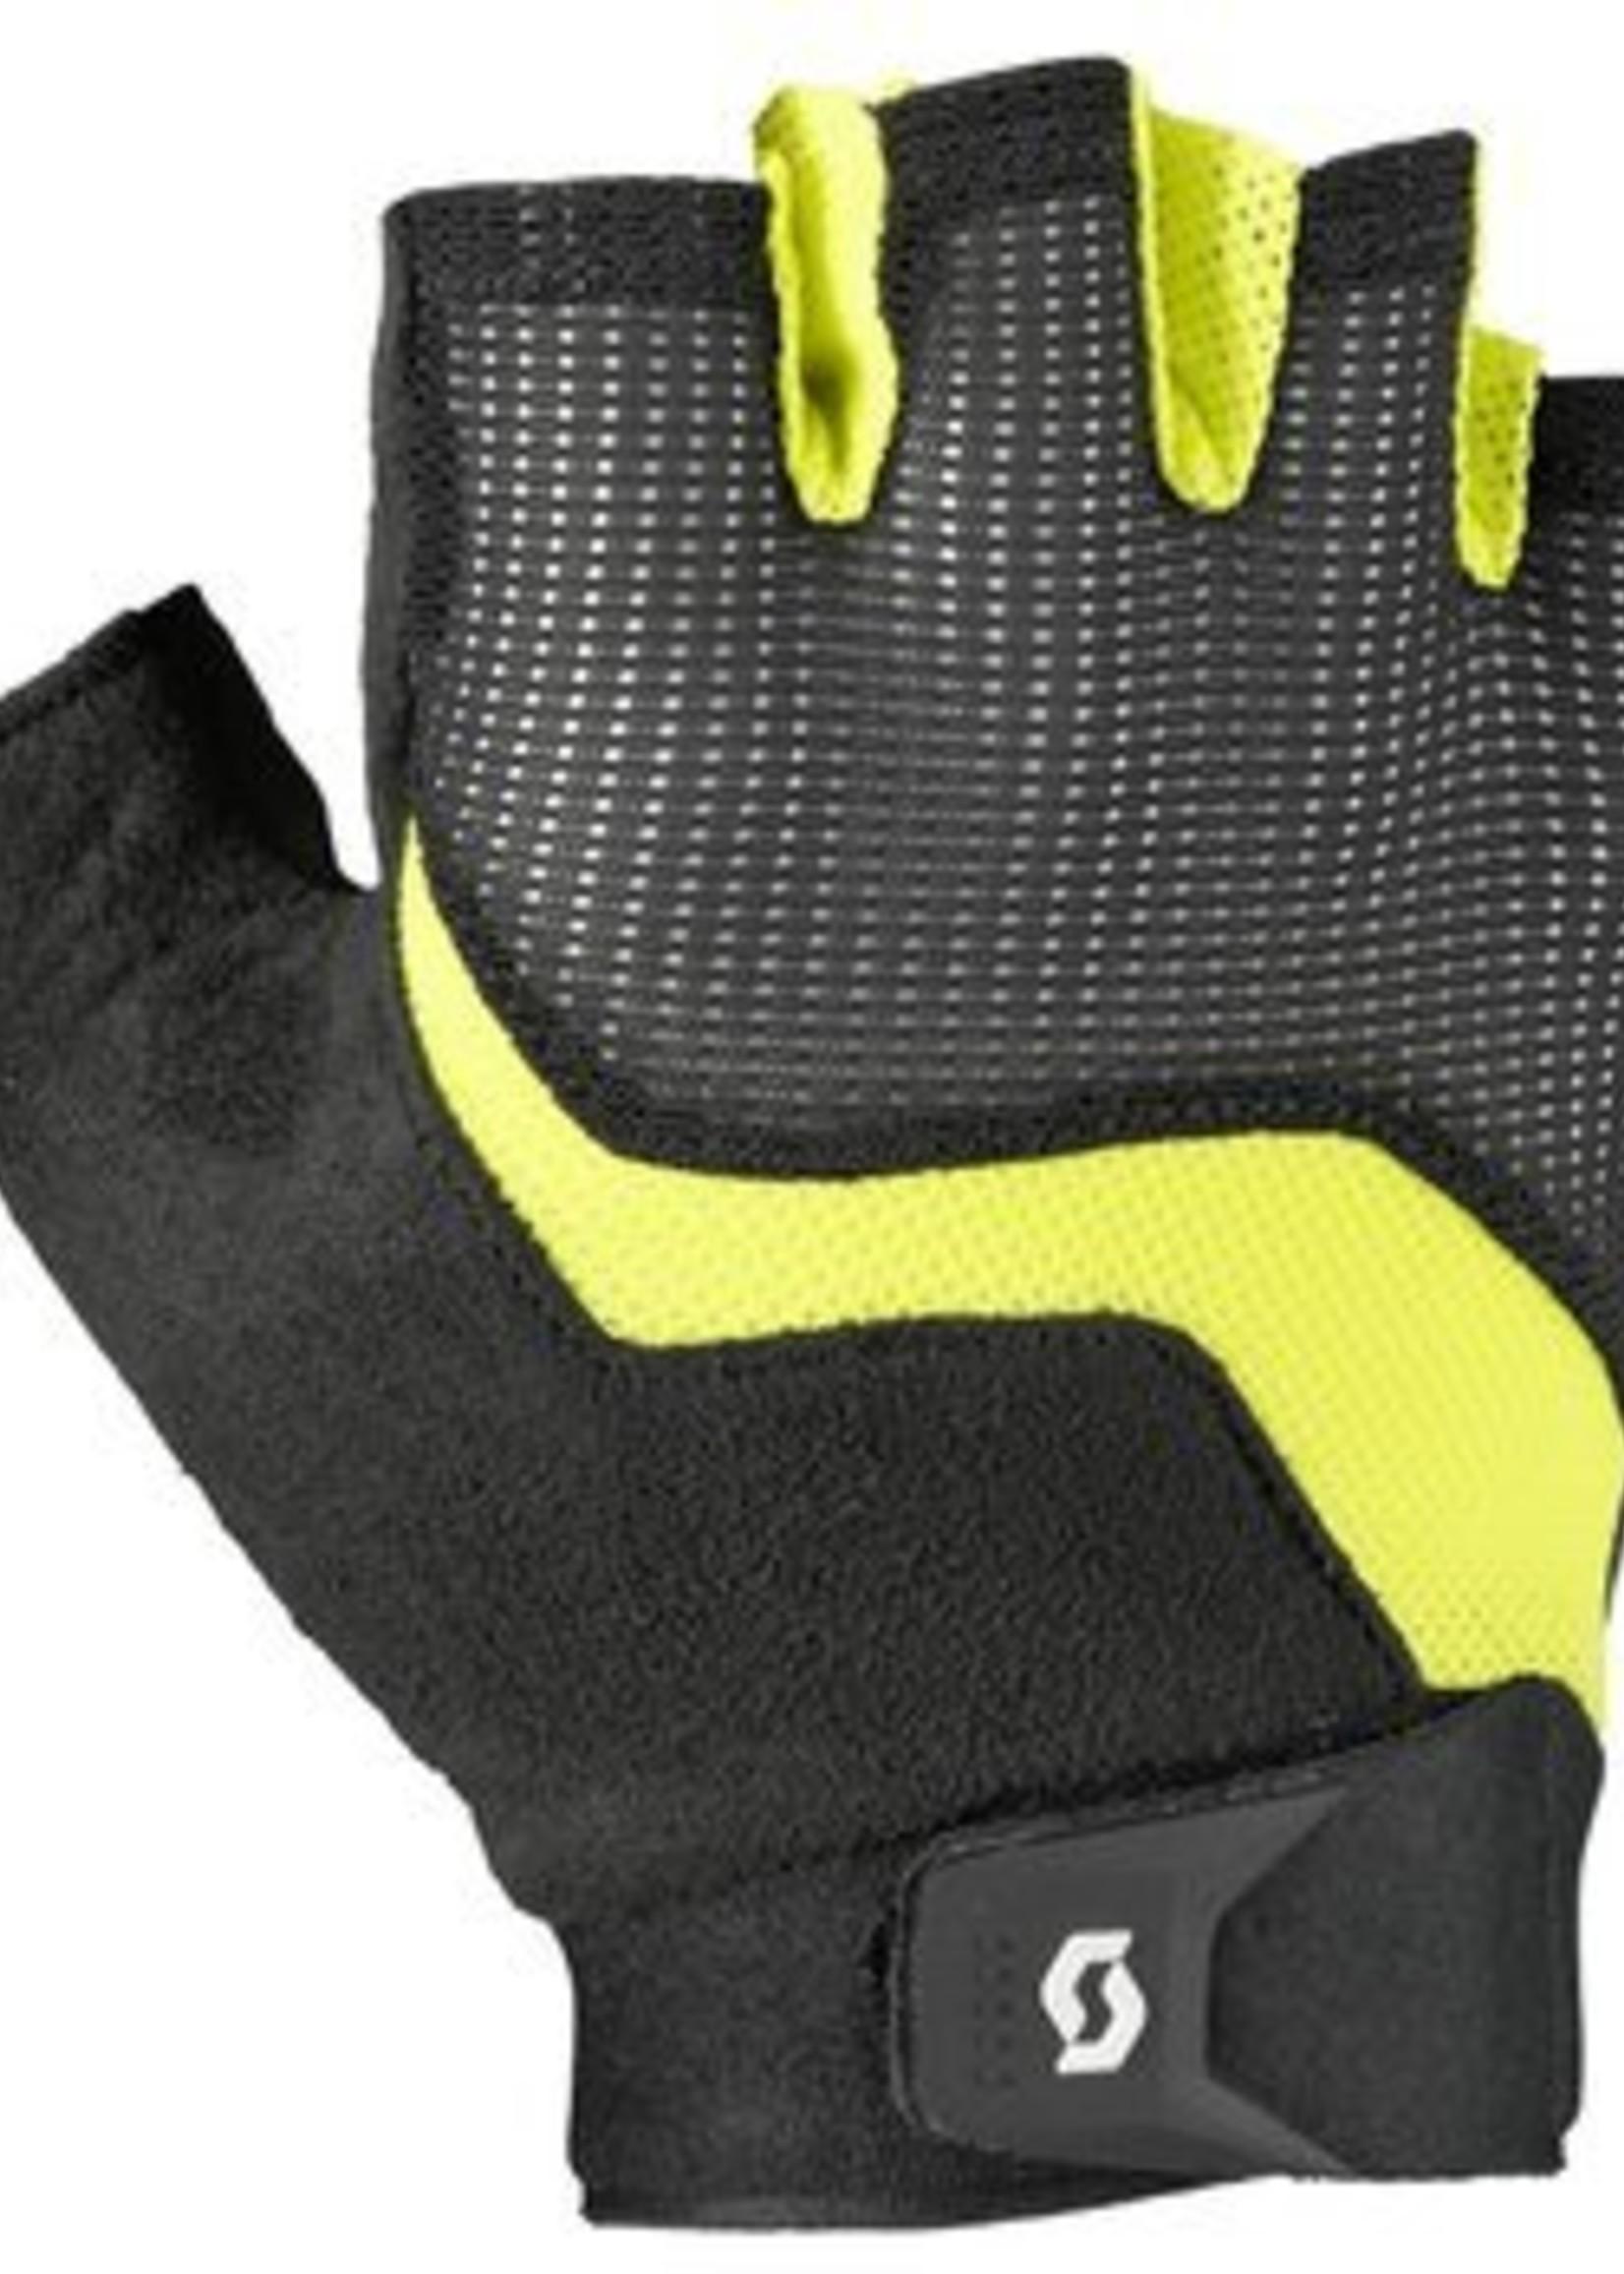 Scott Glove Essential SF unisex